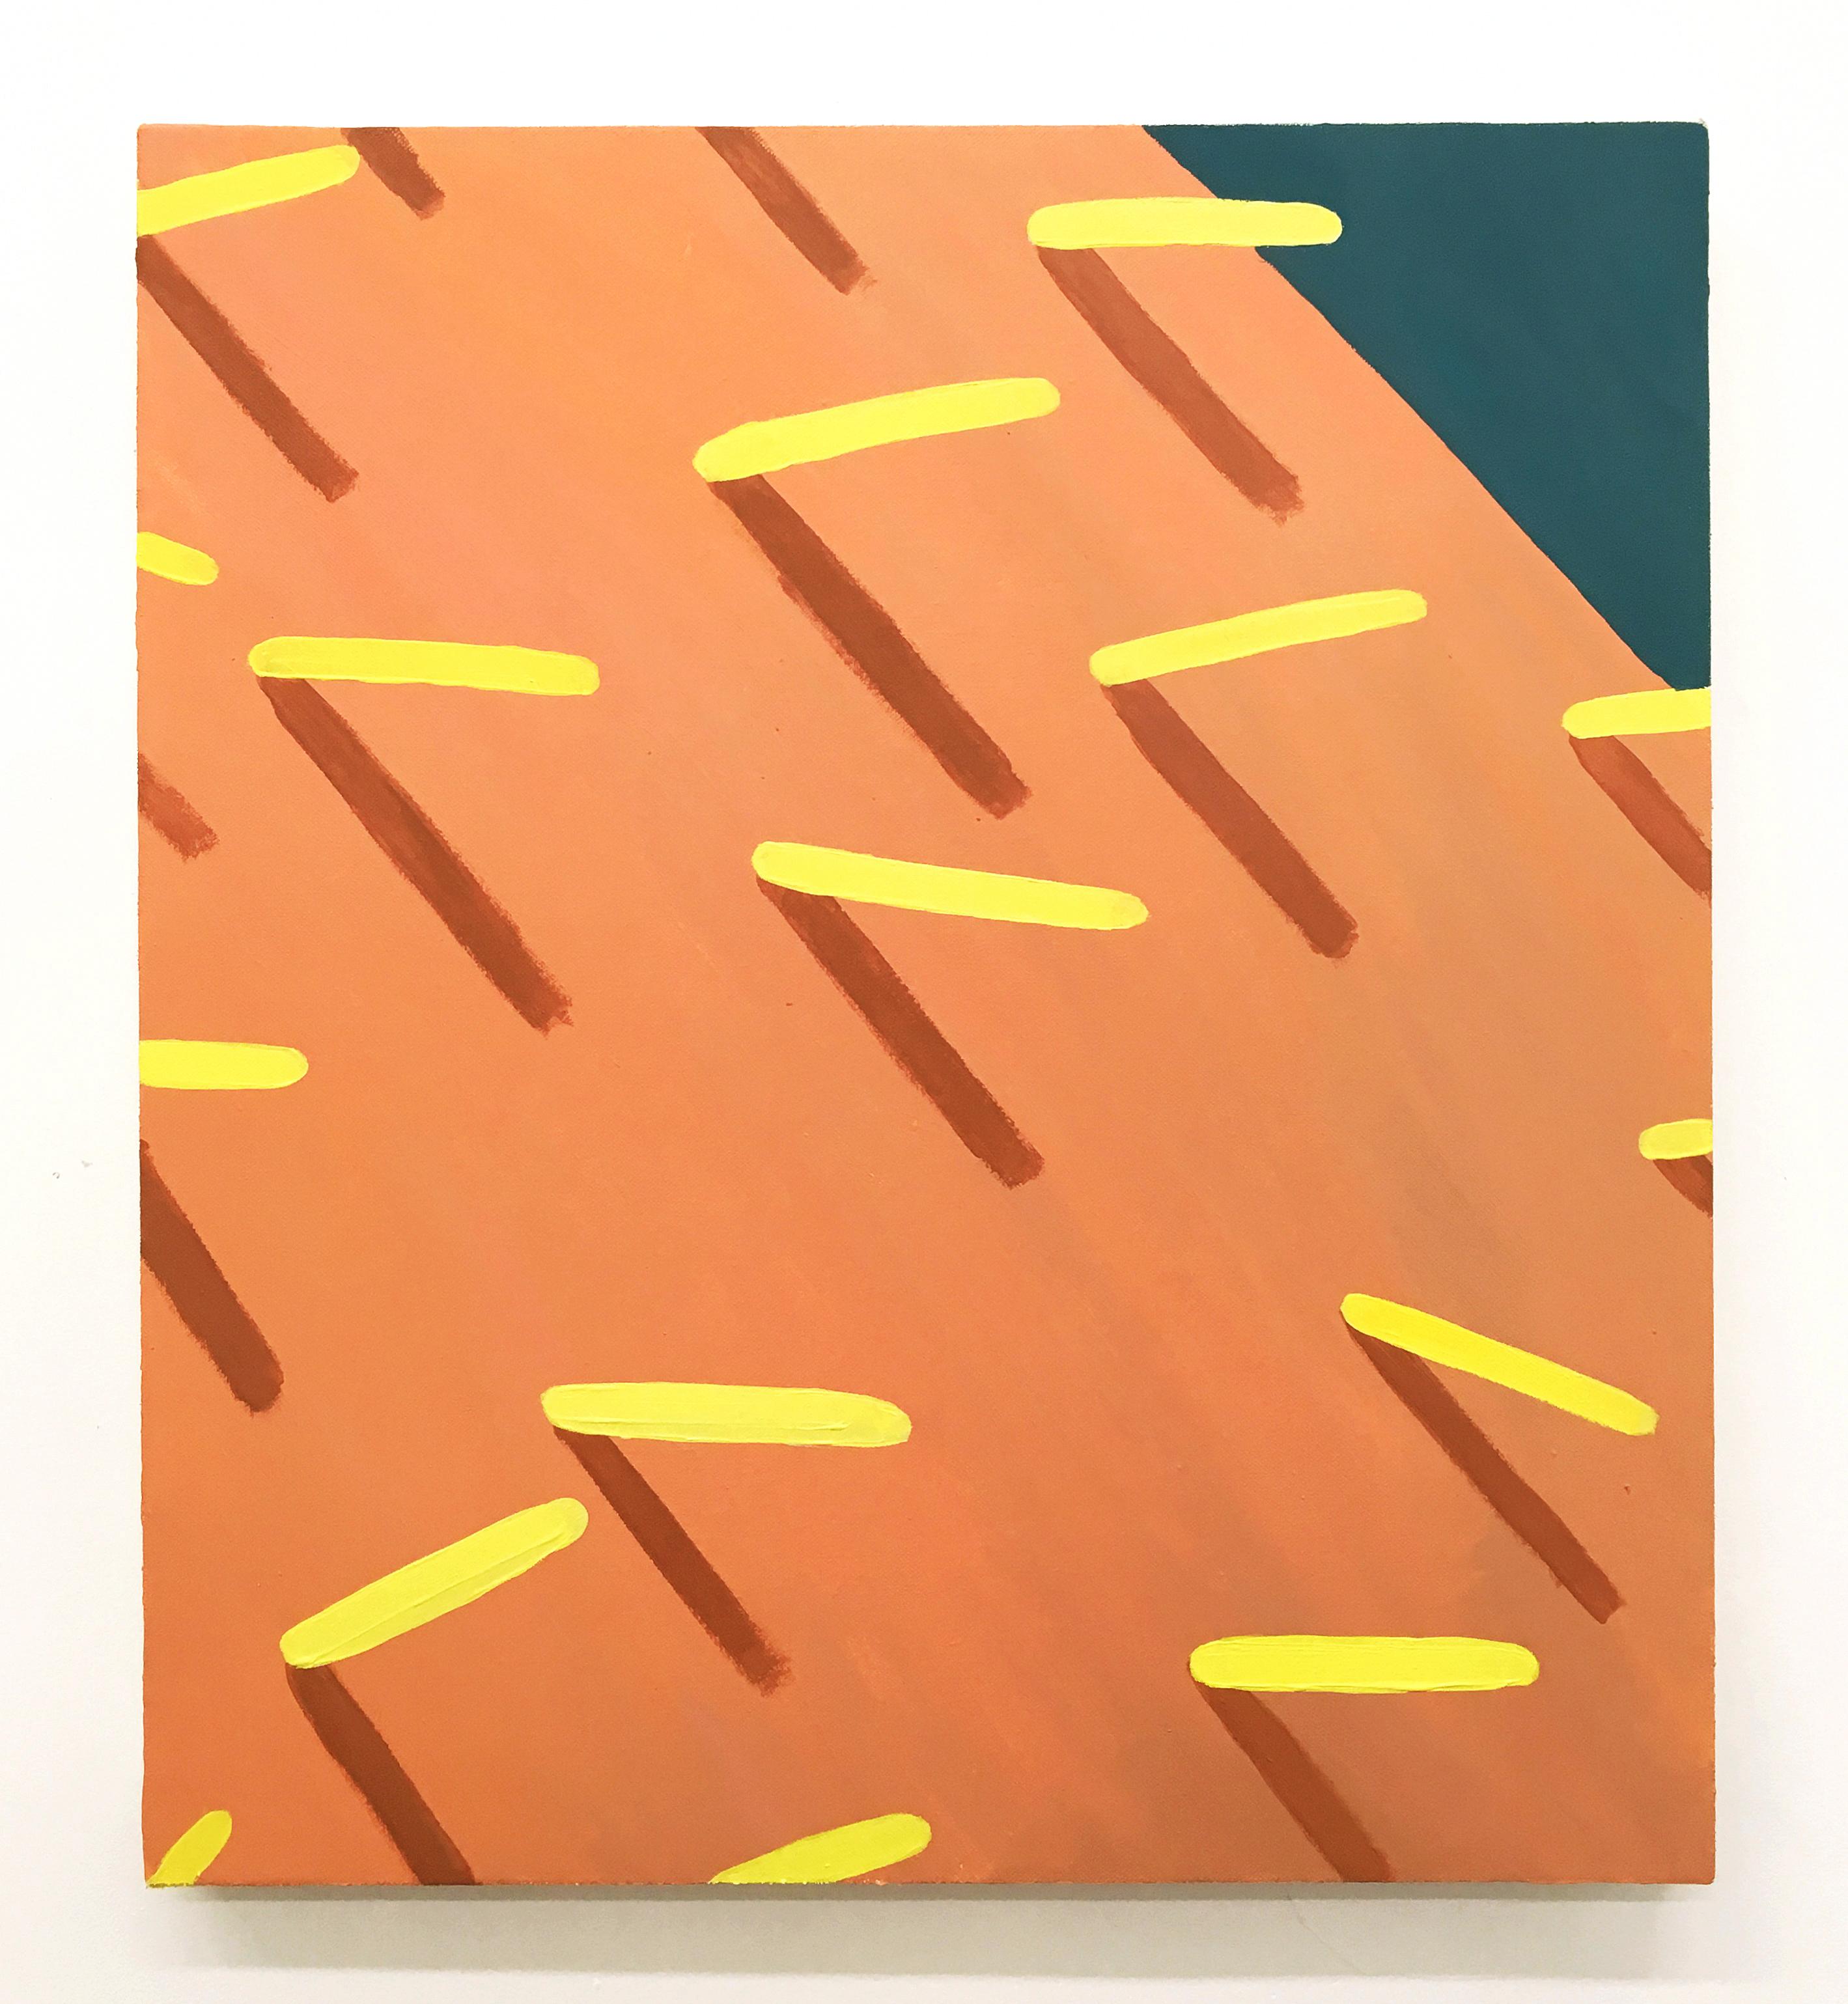 Corydon Cowansage, Grass #80, 2018, 20 x 18 inches, acrylic on canvas